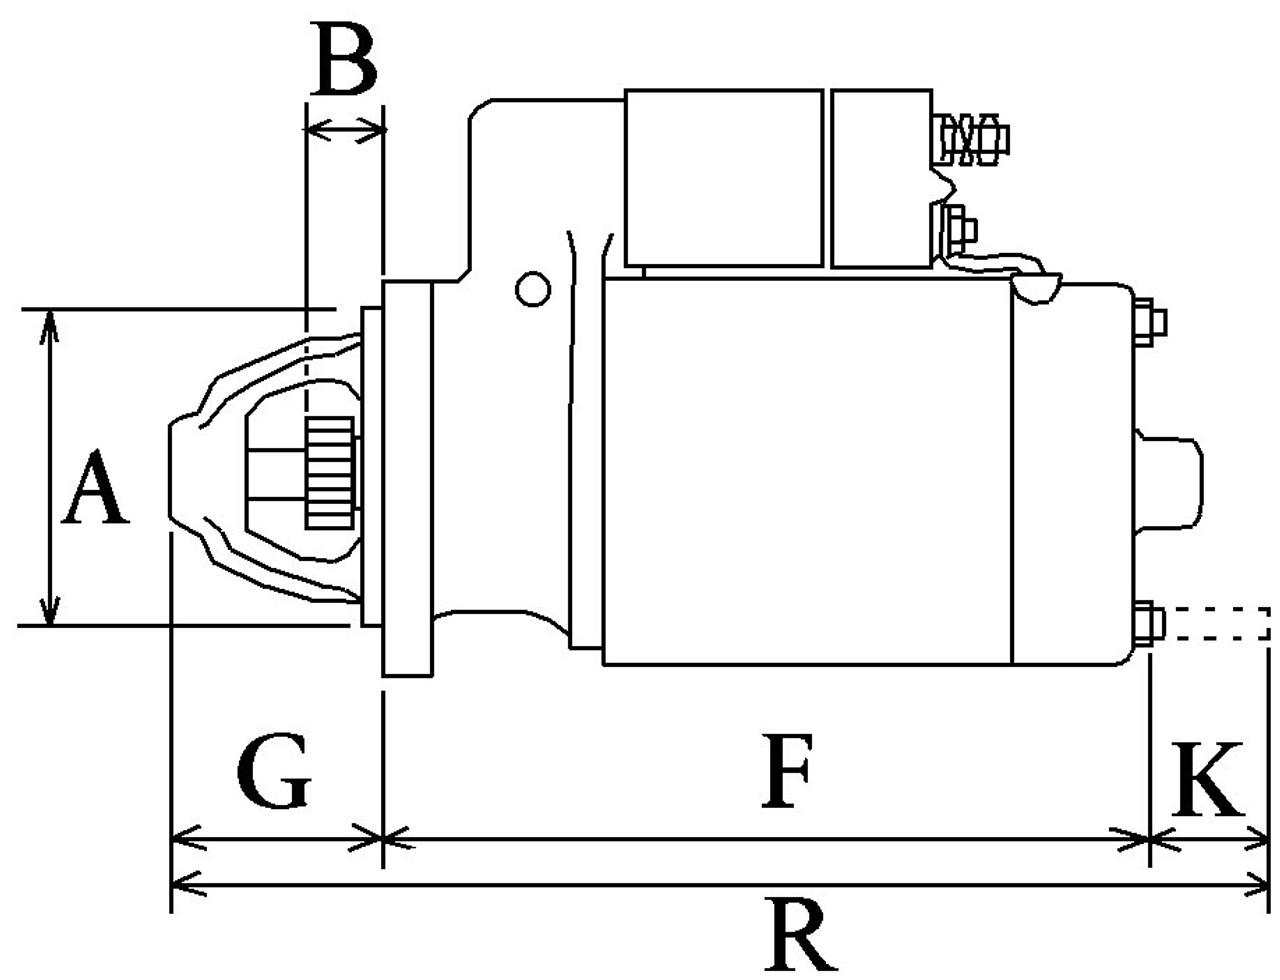 medium resolution of 3gm30f yanmar starter motor wiring diagram yanmar 3gm30f partsyanmar 3gm30 starter motor on yanmar 3gm30f parts